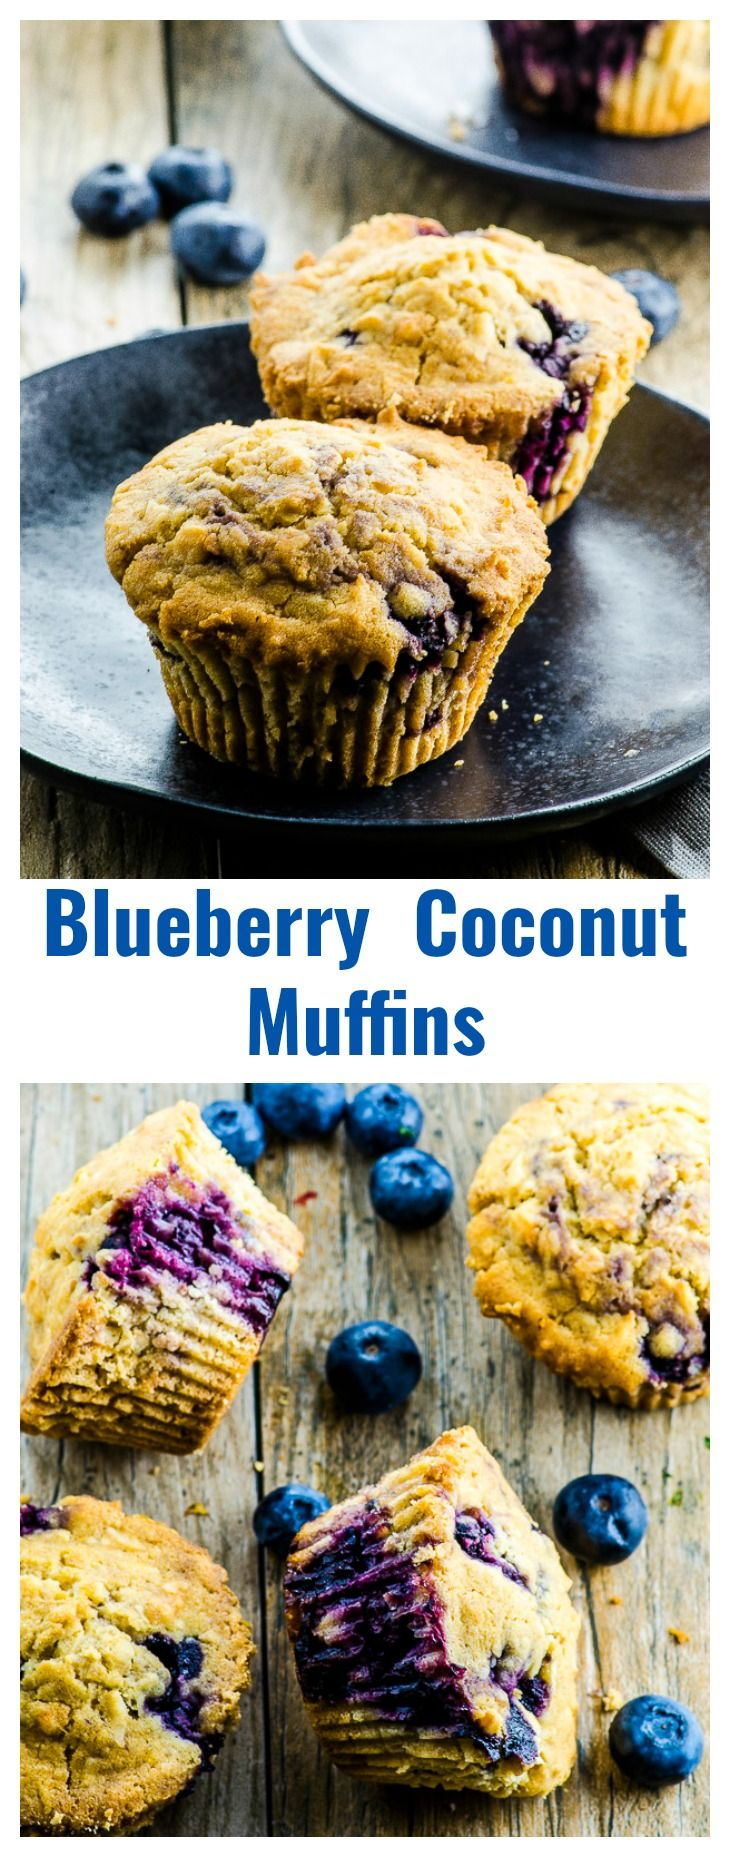 If you like those gigantic coffee shop muffins, yo…